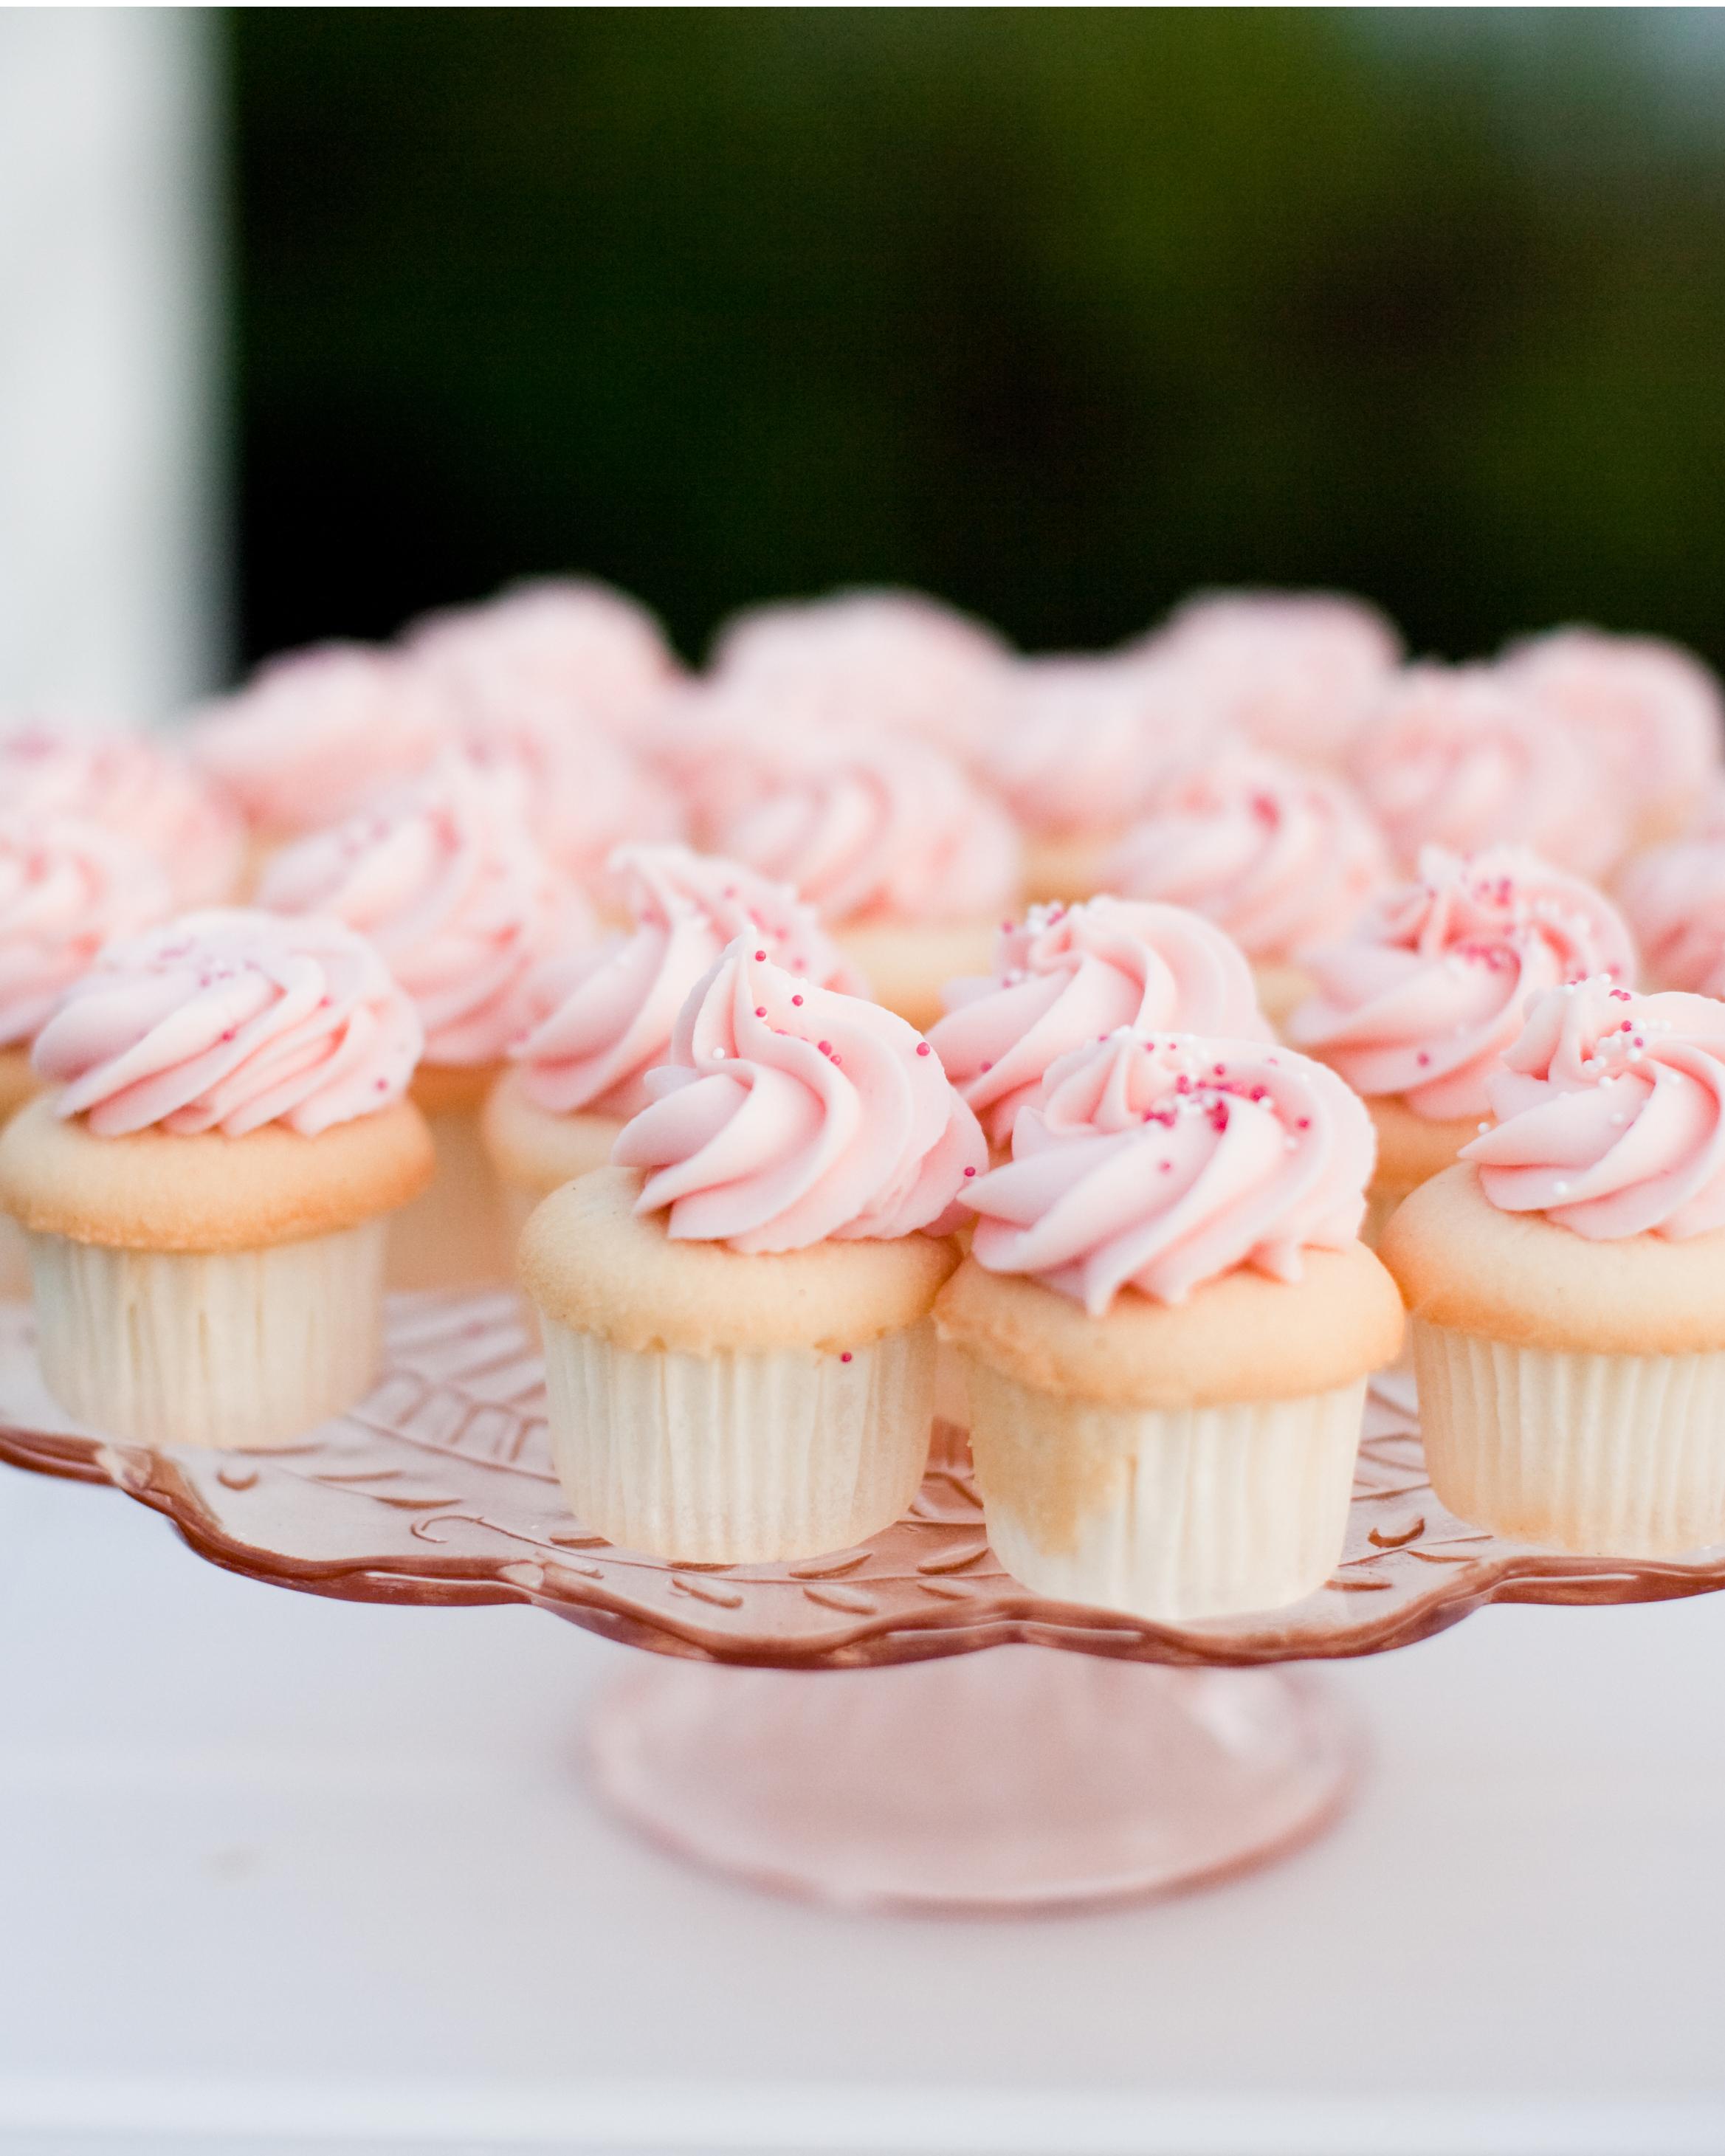 valentines-day-ideas-real-weddings-cupcakes-0115.jpg